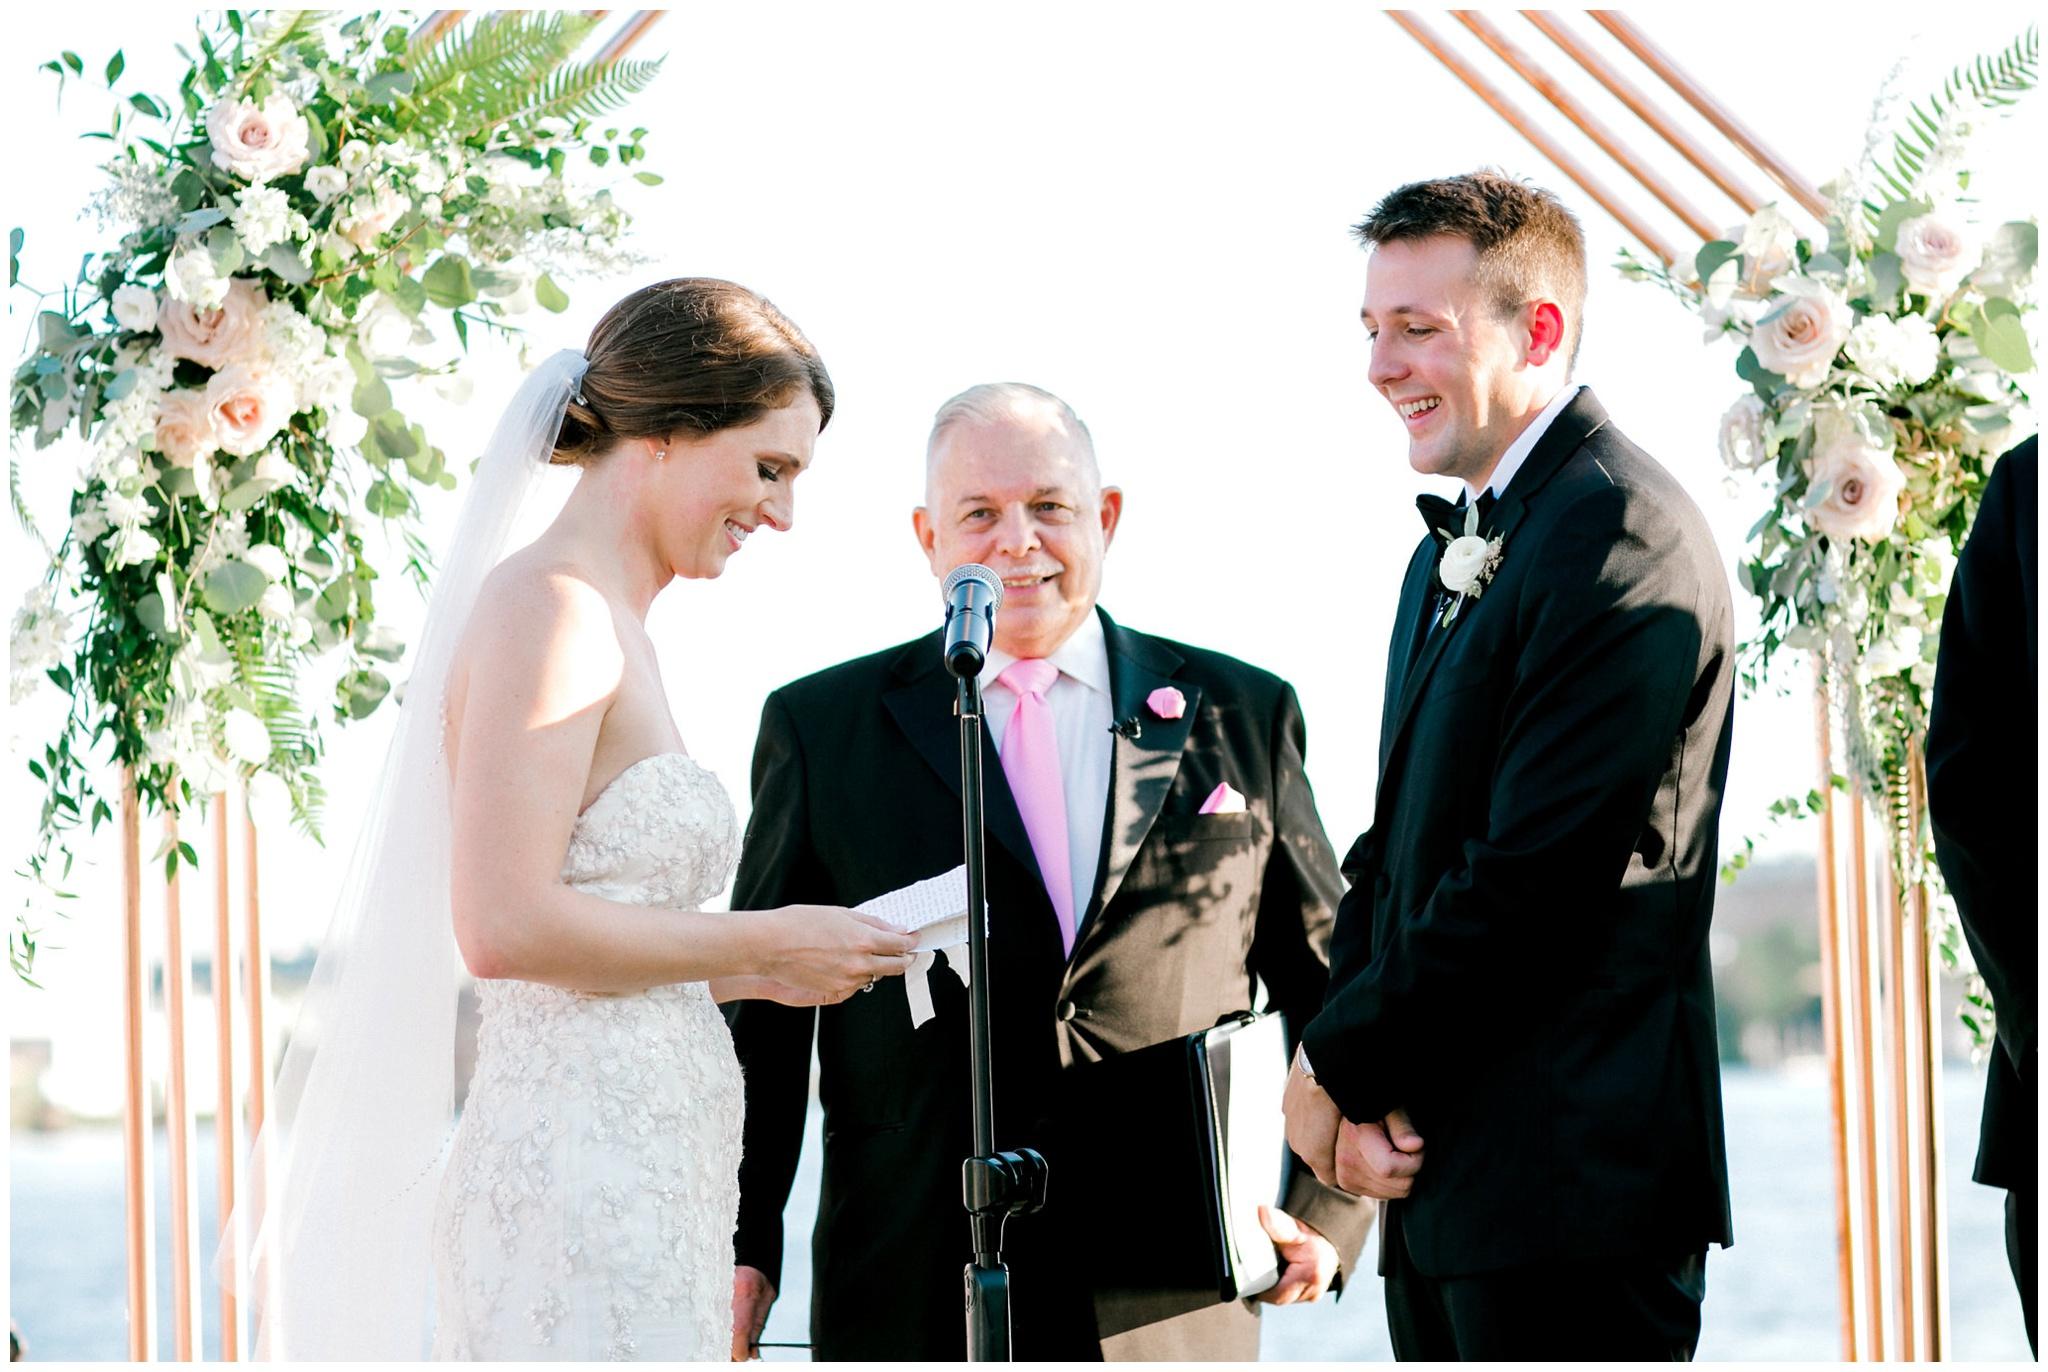 baltimore wedding photographer, baltimore wedding photography, baltimore wedding venue, baltimore wedding, frederick douglass-issac myers maritime park, wedding photographer in baltimore, maryland wedding photographer